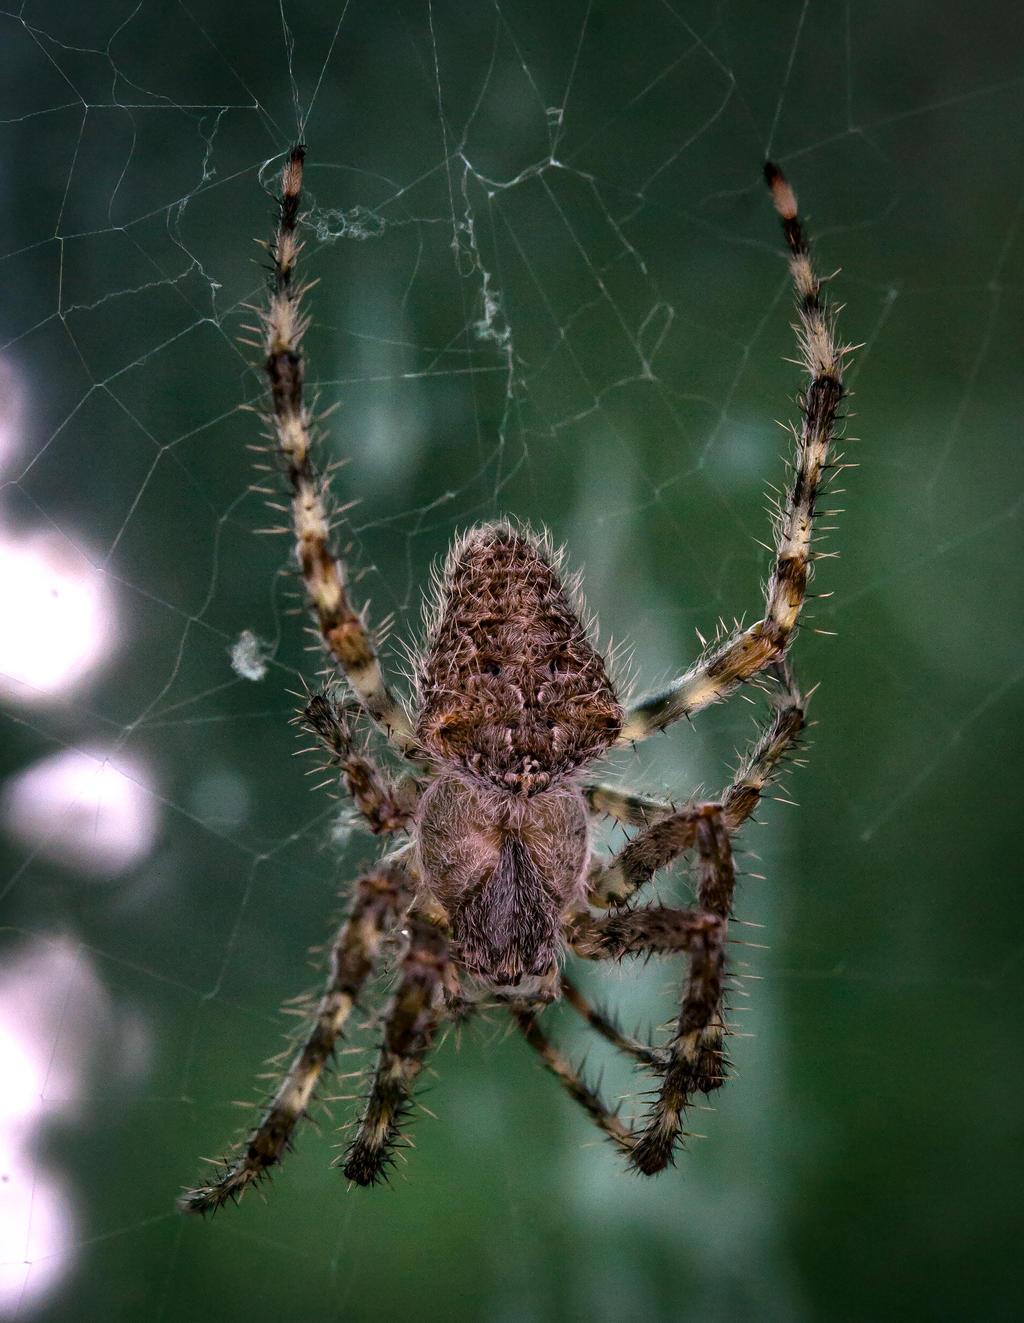 Barn Spider Vt By Wanderingmogwai On Deviantart